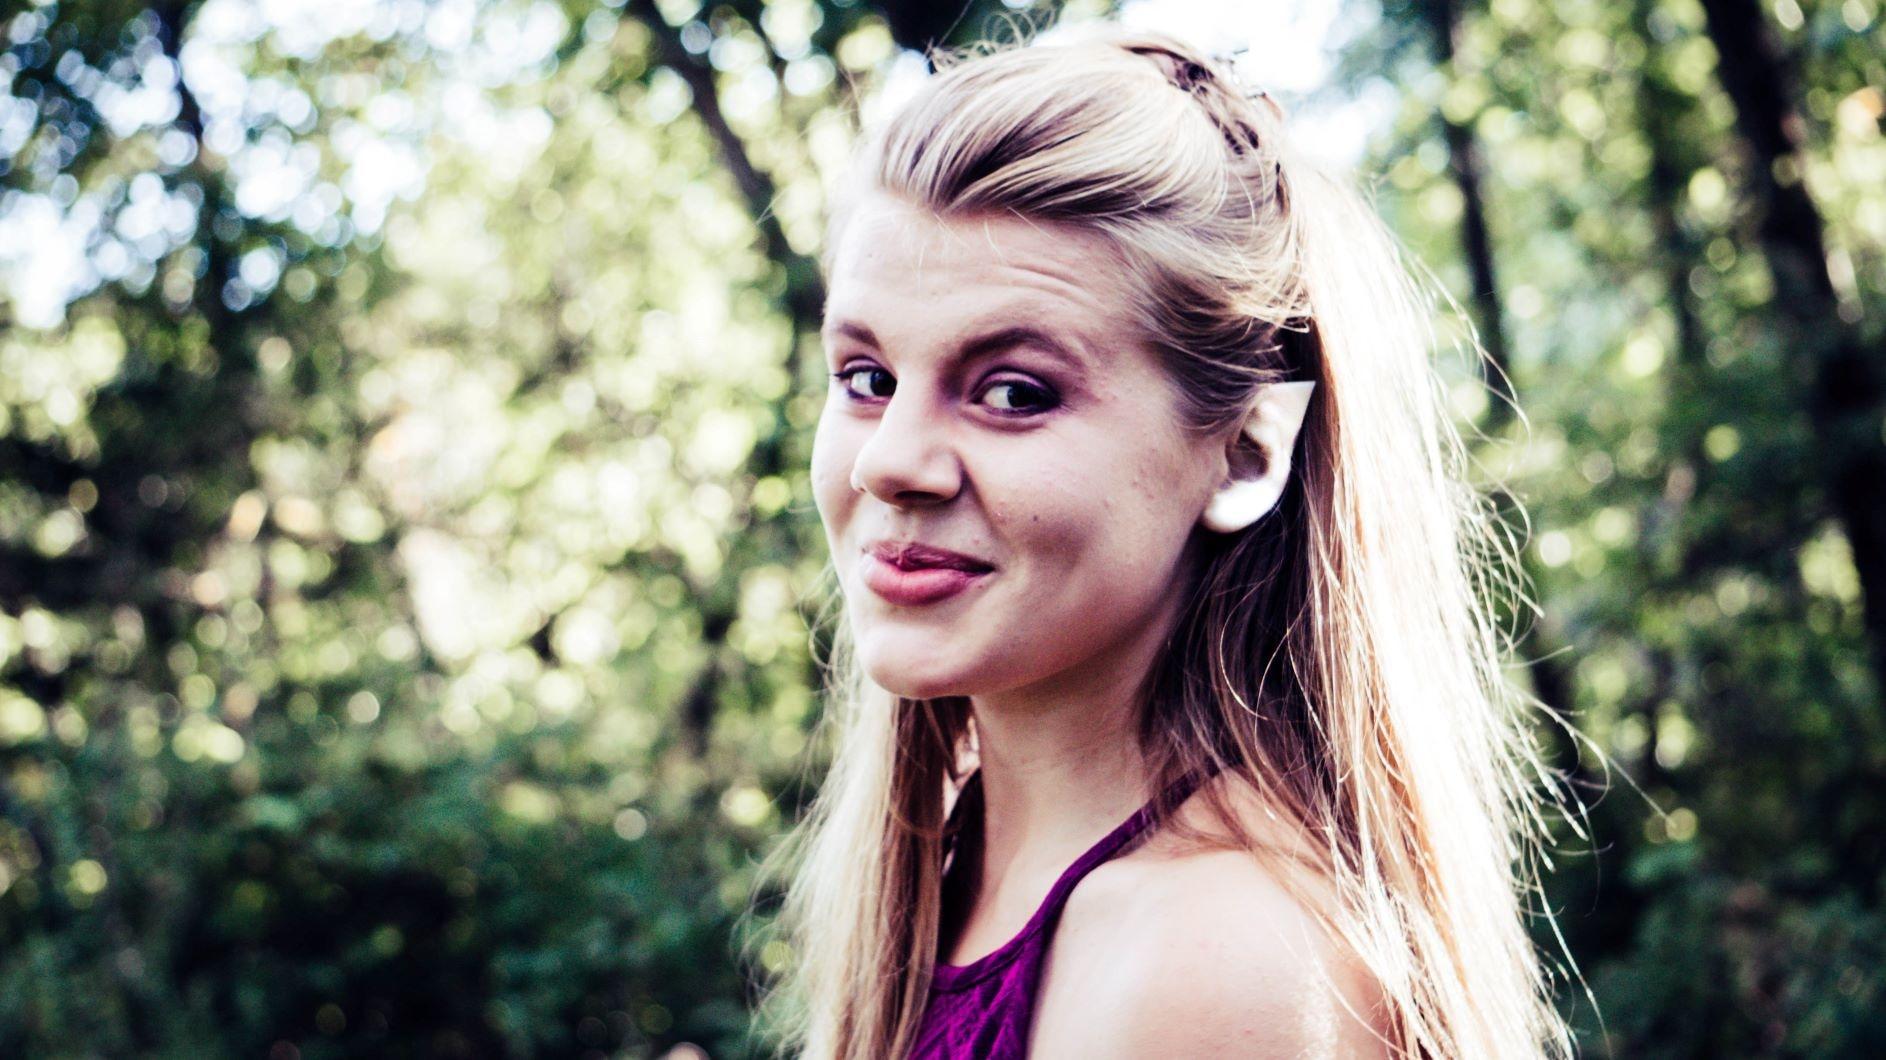 Go to Kalea Jerielle's profile